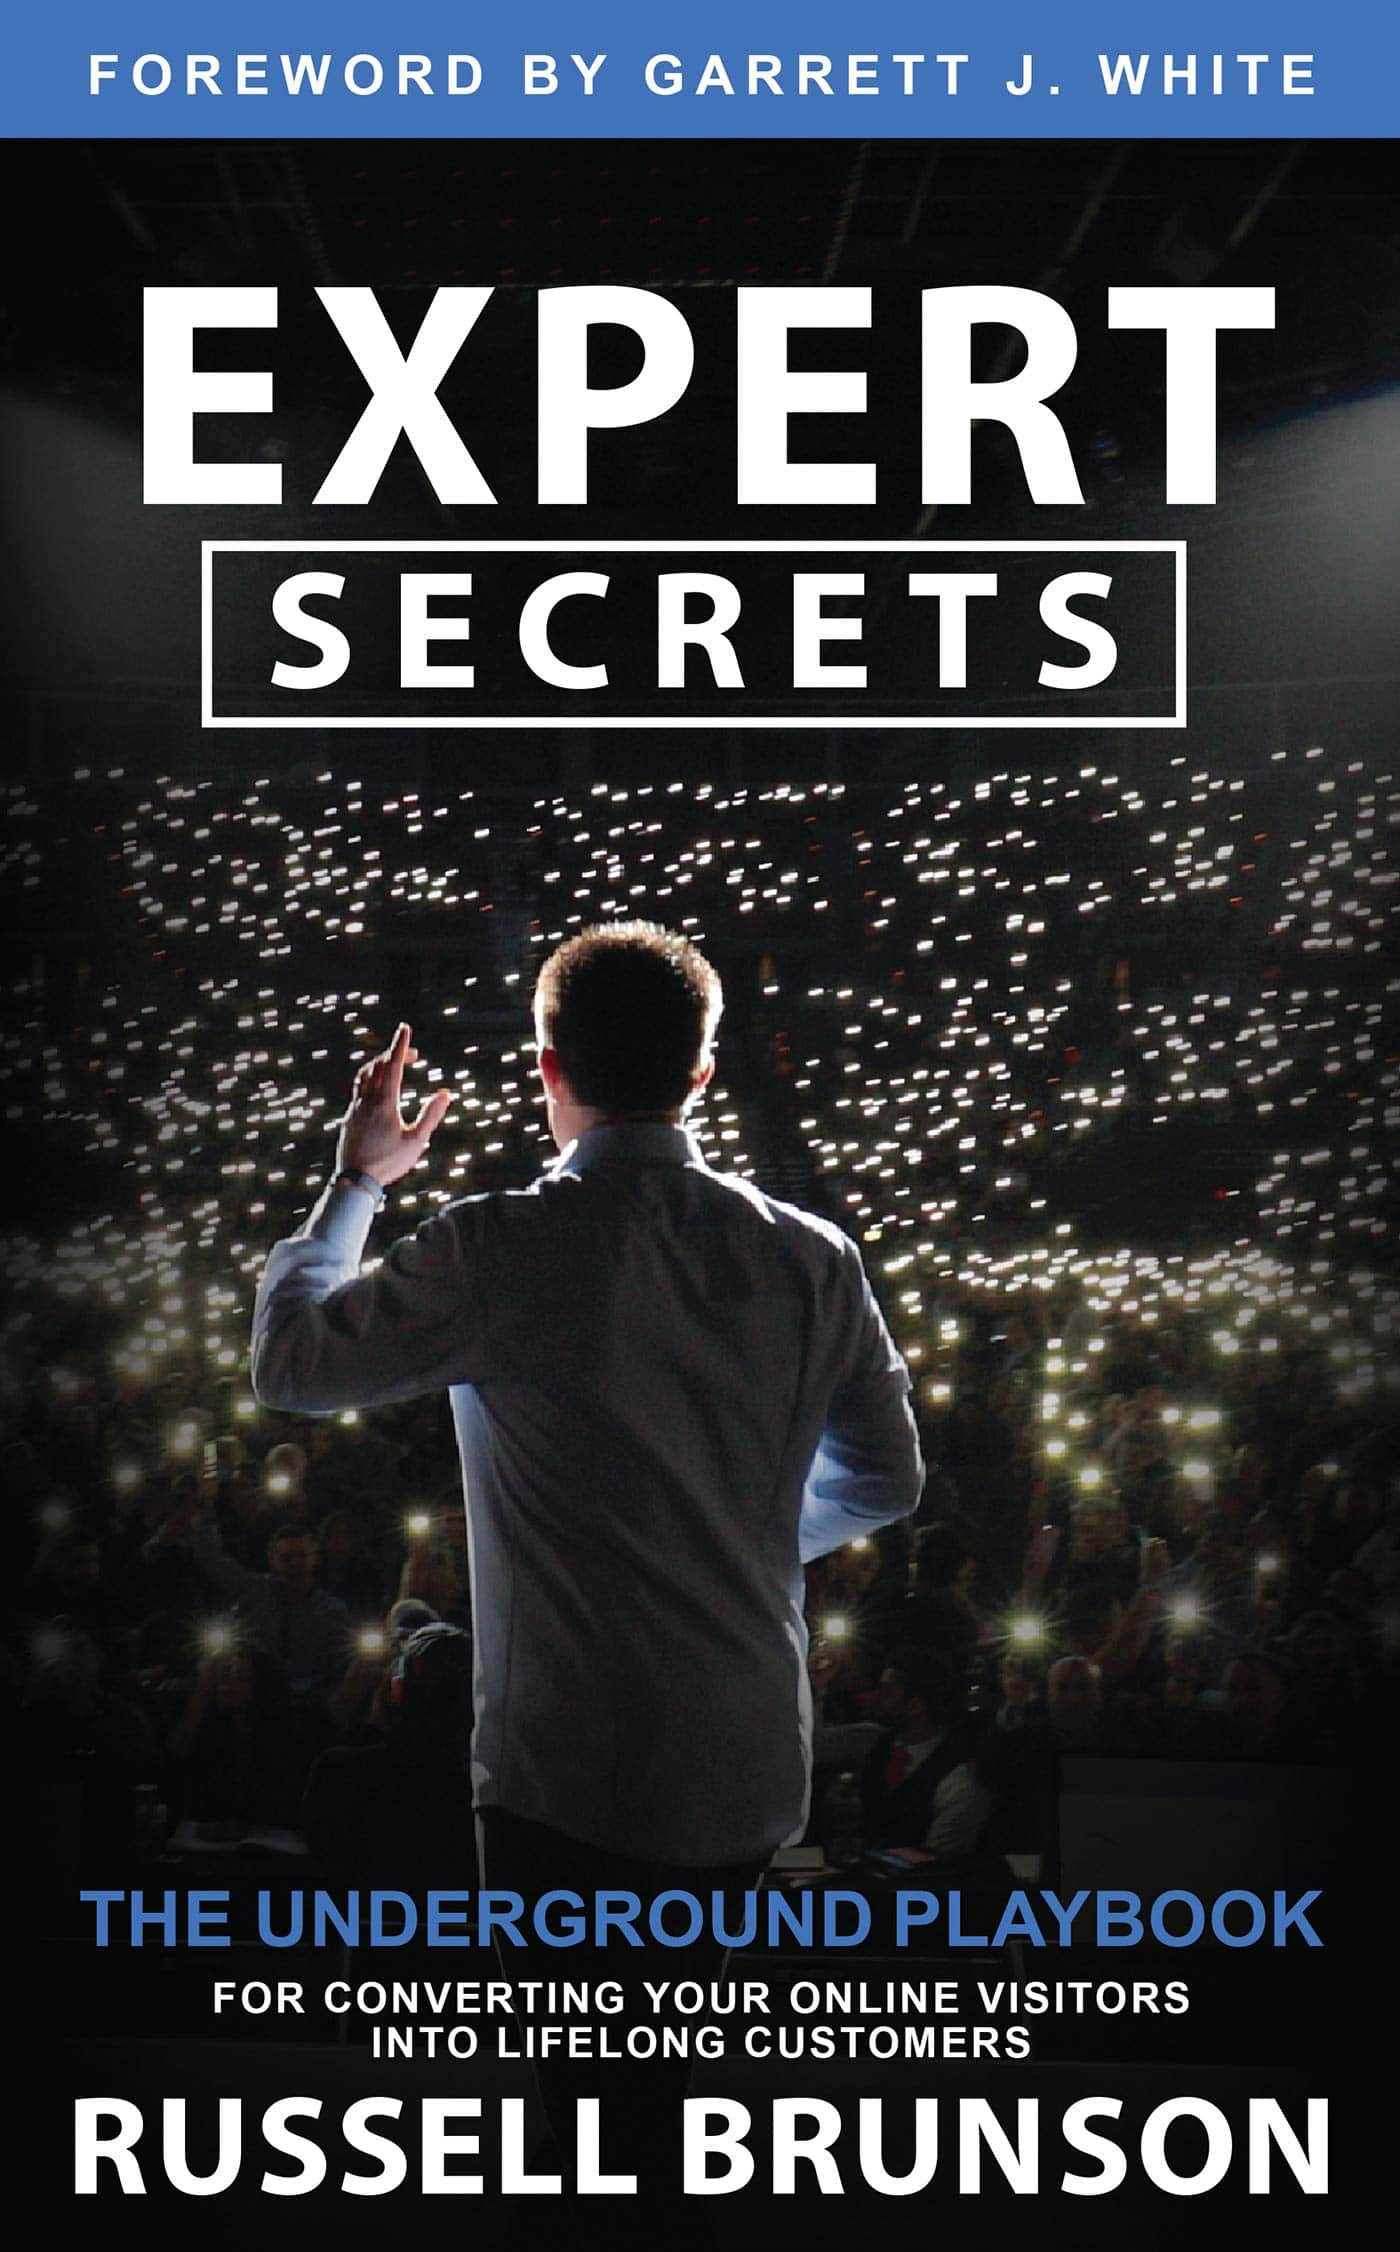 Expert Secrets - Book cover